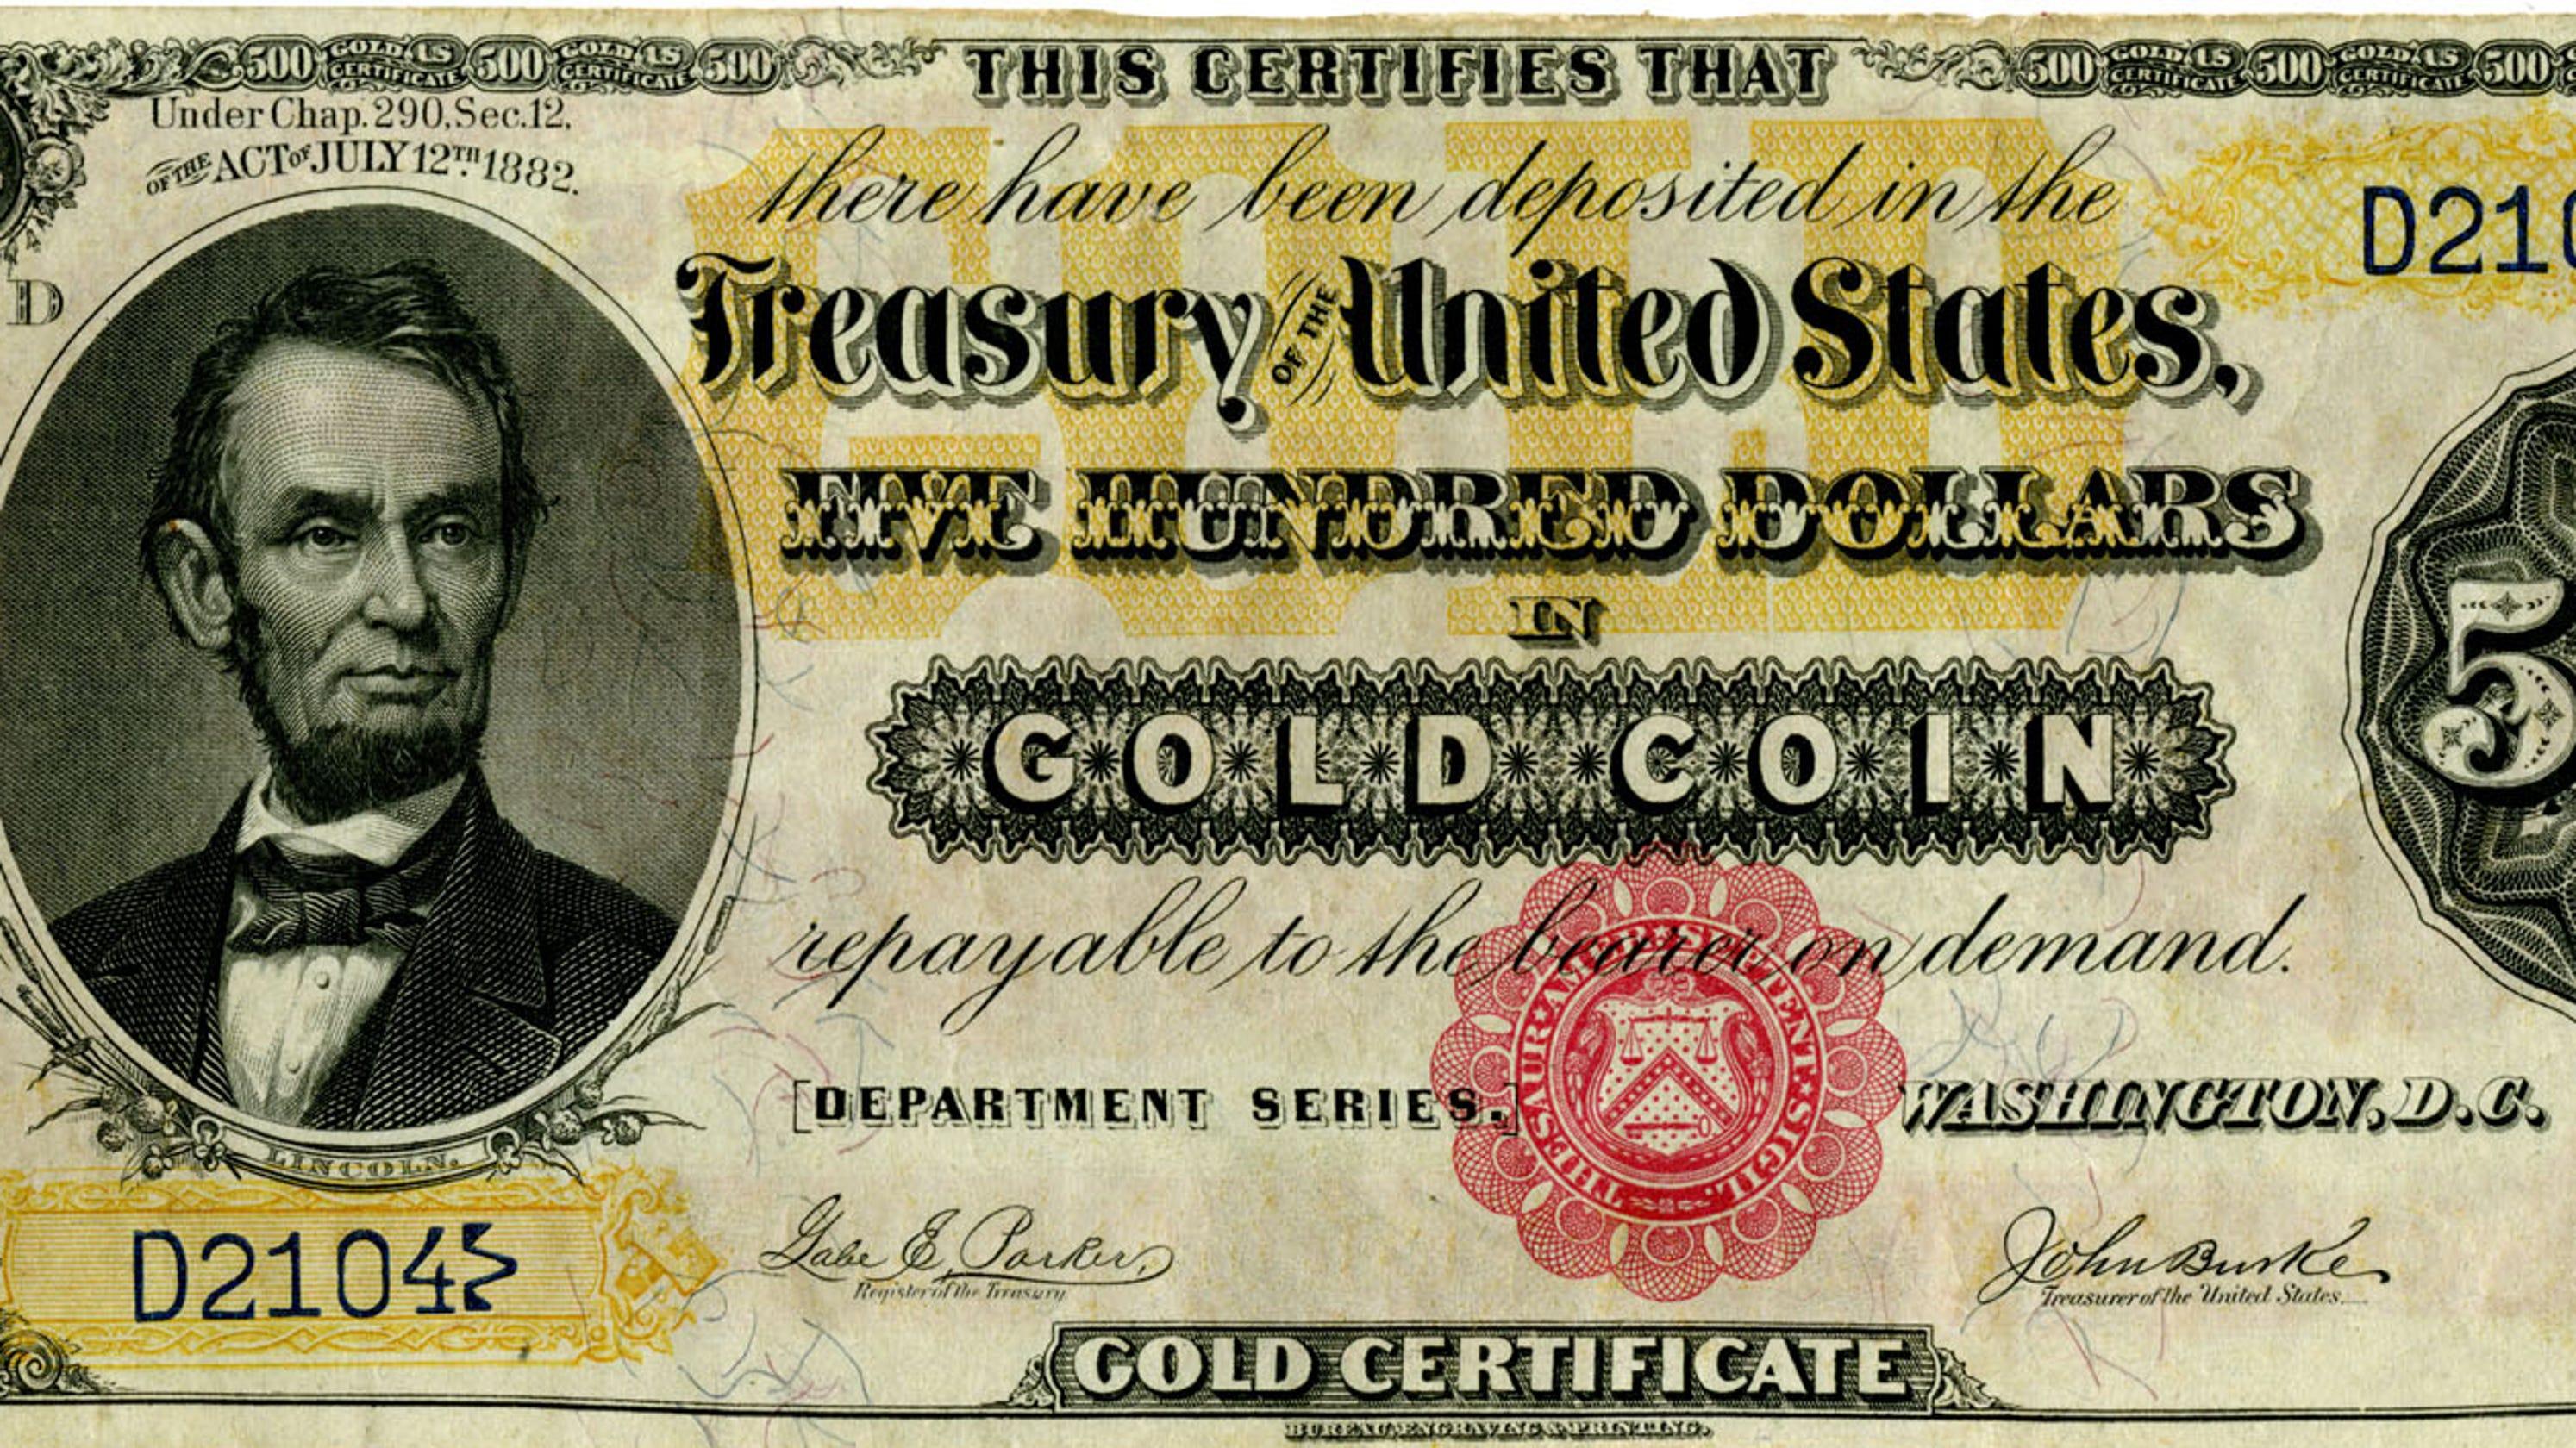 Asbury Park secret safe had $3 5M in gold certificates